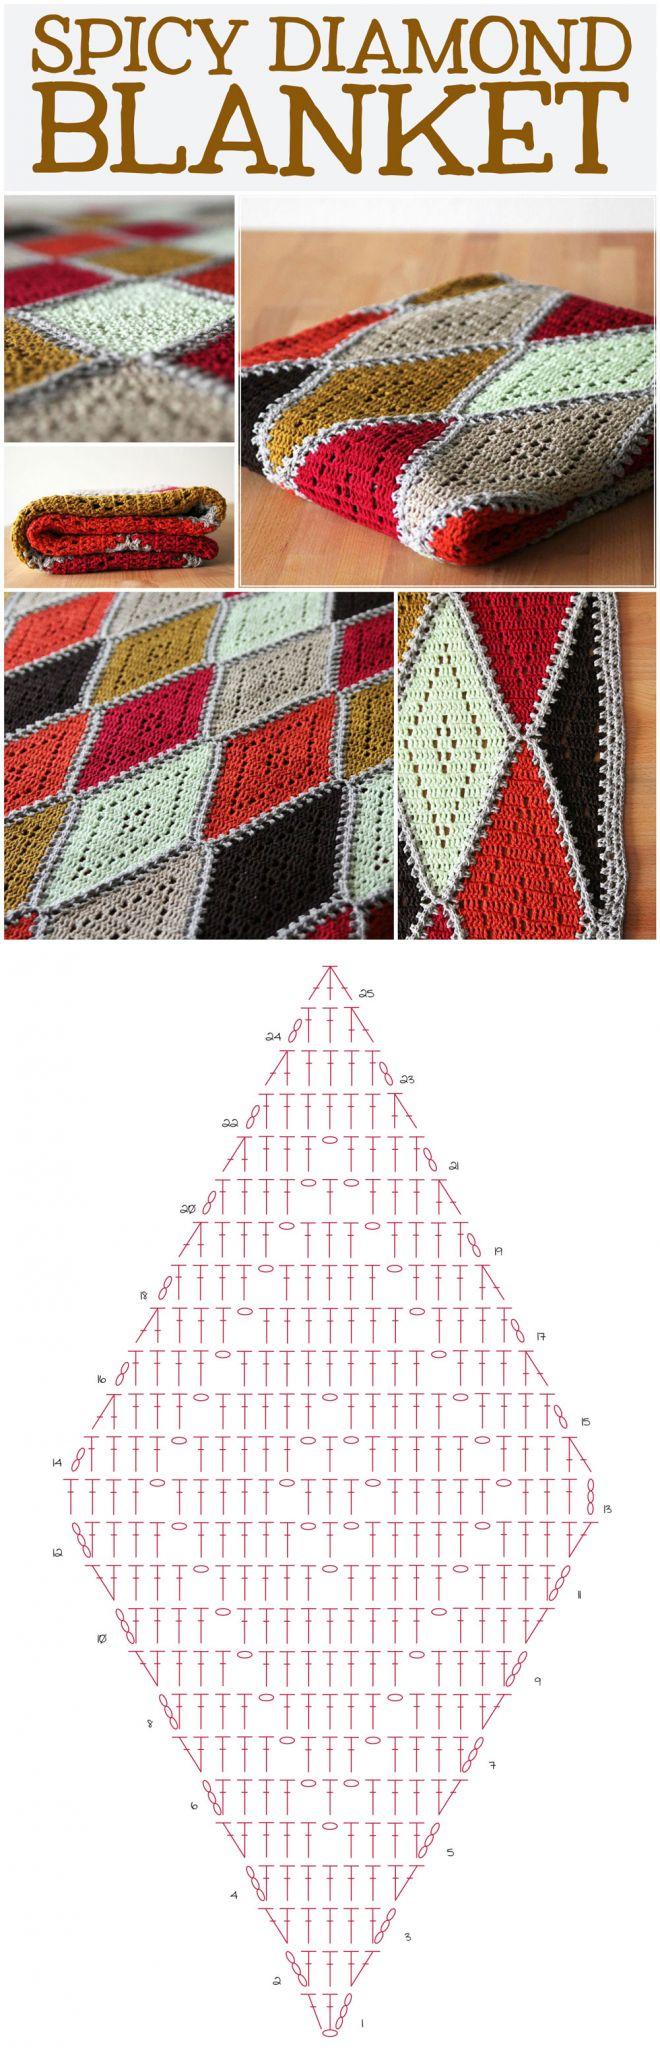 Free crochet pattern: spicy diamond blanket - haak maar Raak...♥ Deniz ♥